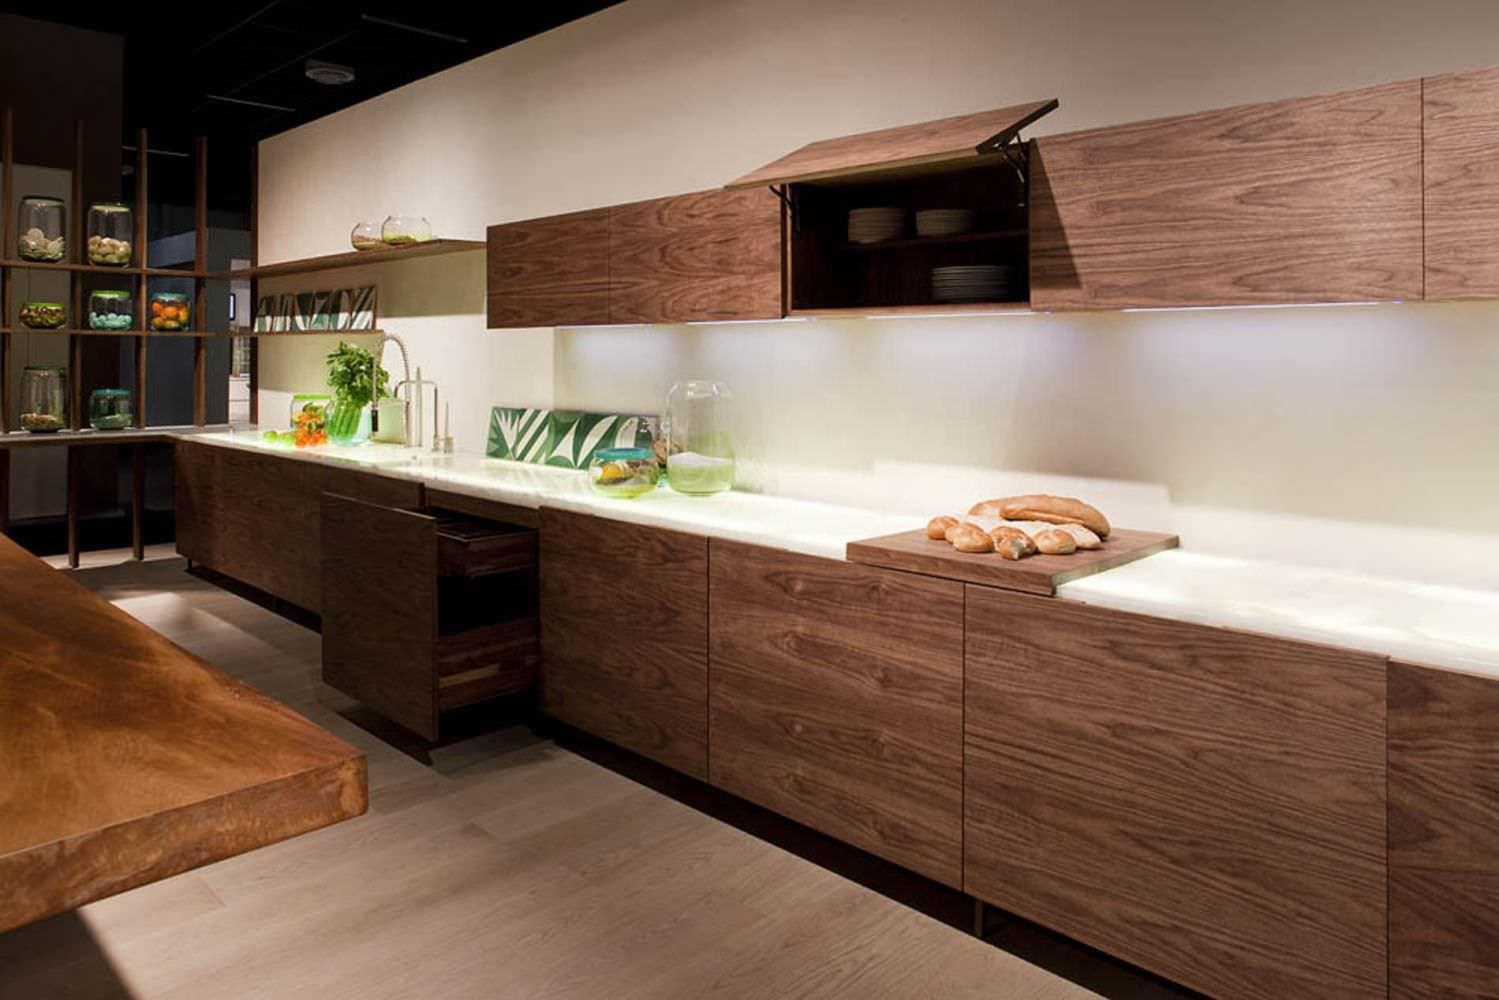 Moderne Küche / Holz / Kochinsel - LA CUCINA by Matteo Thun - Riva ...